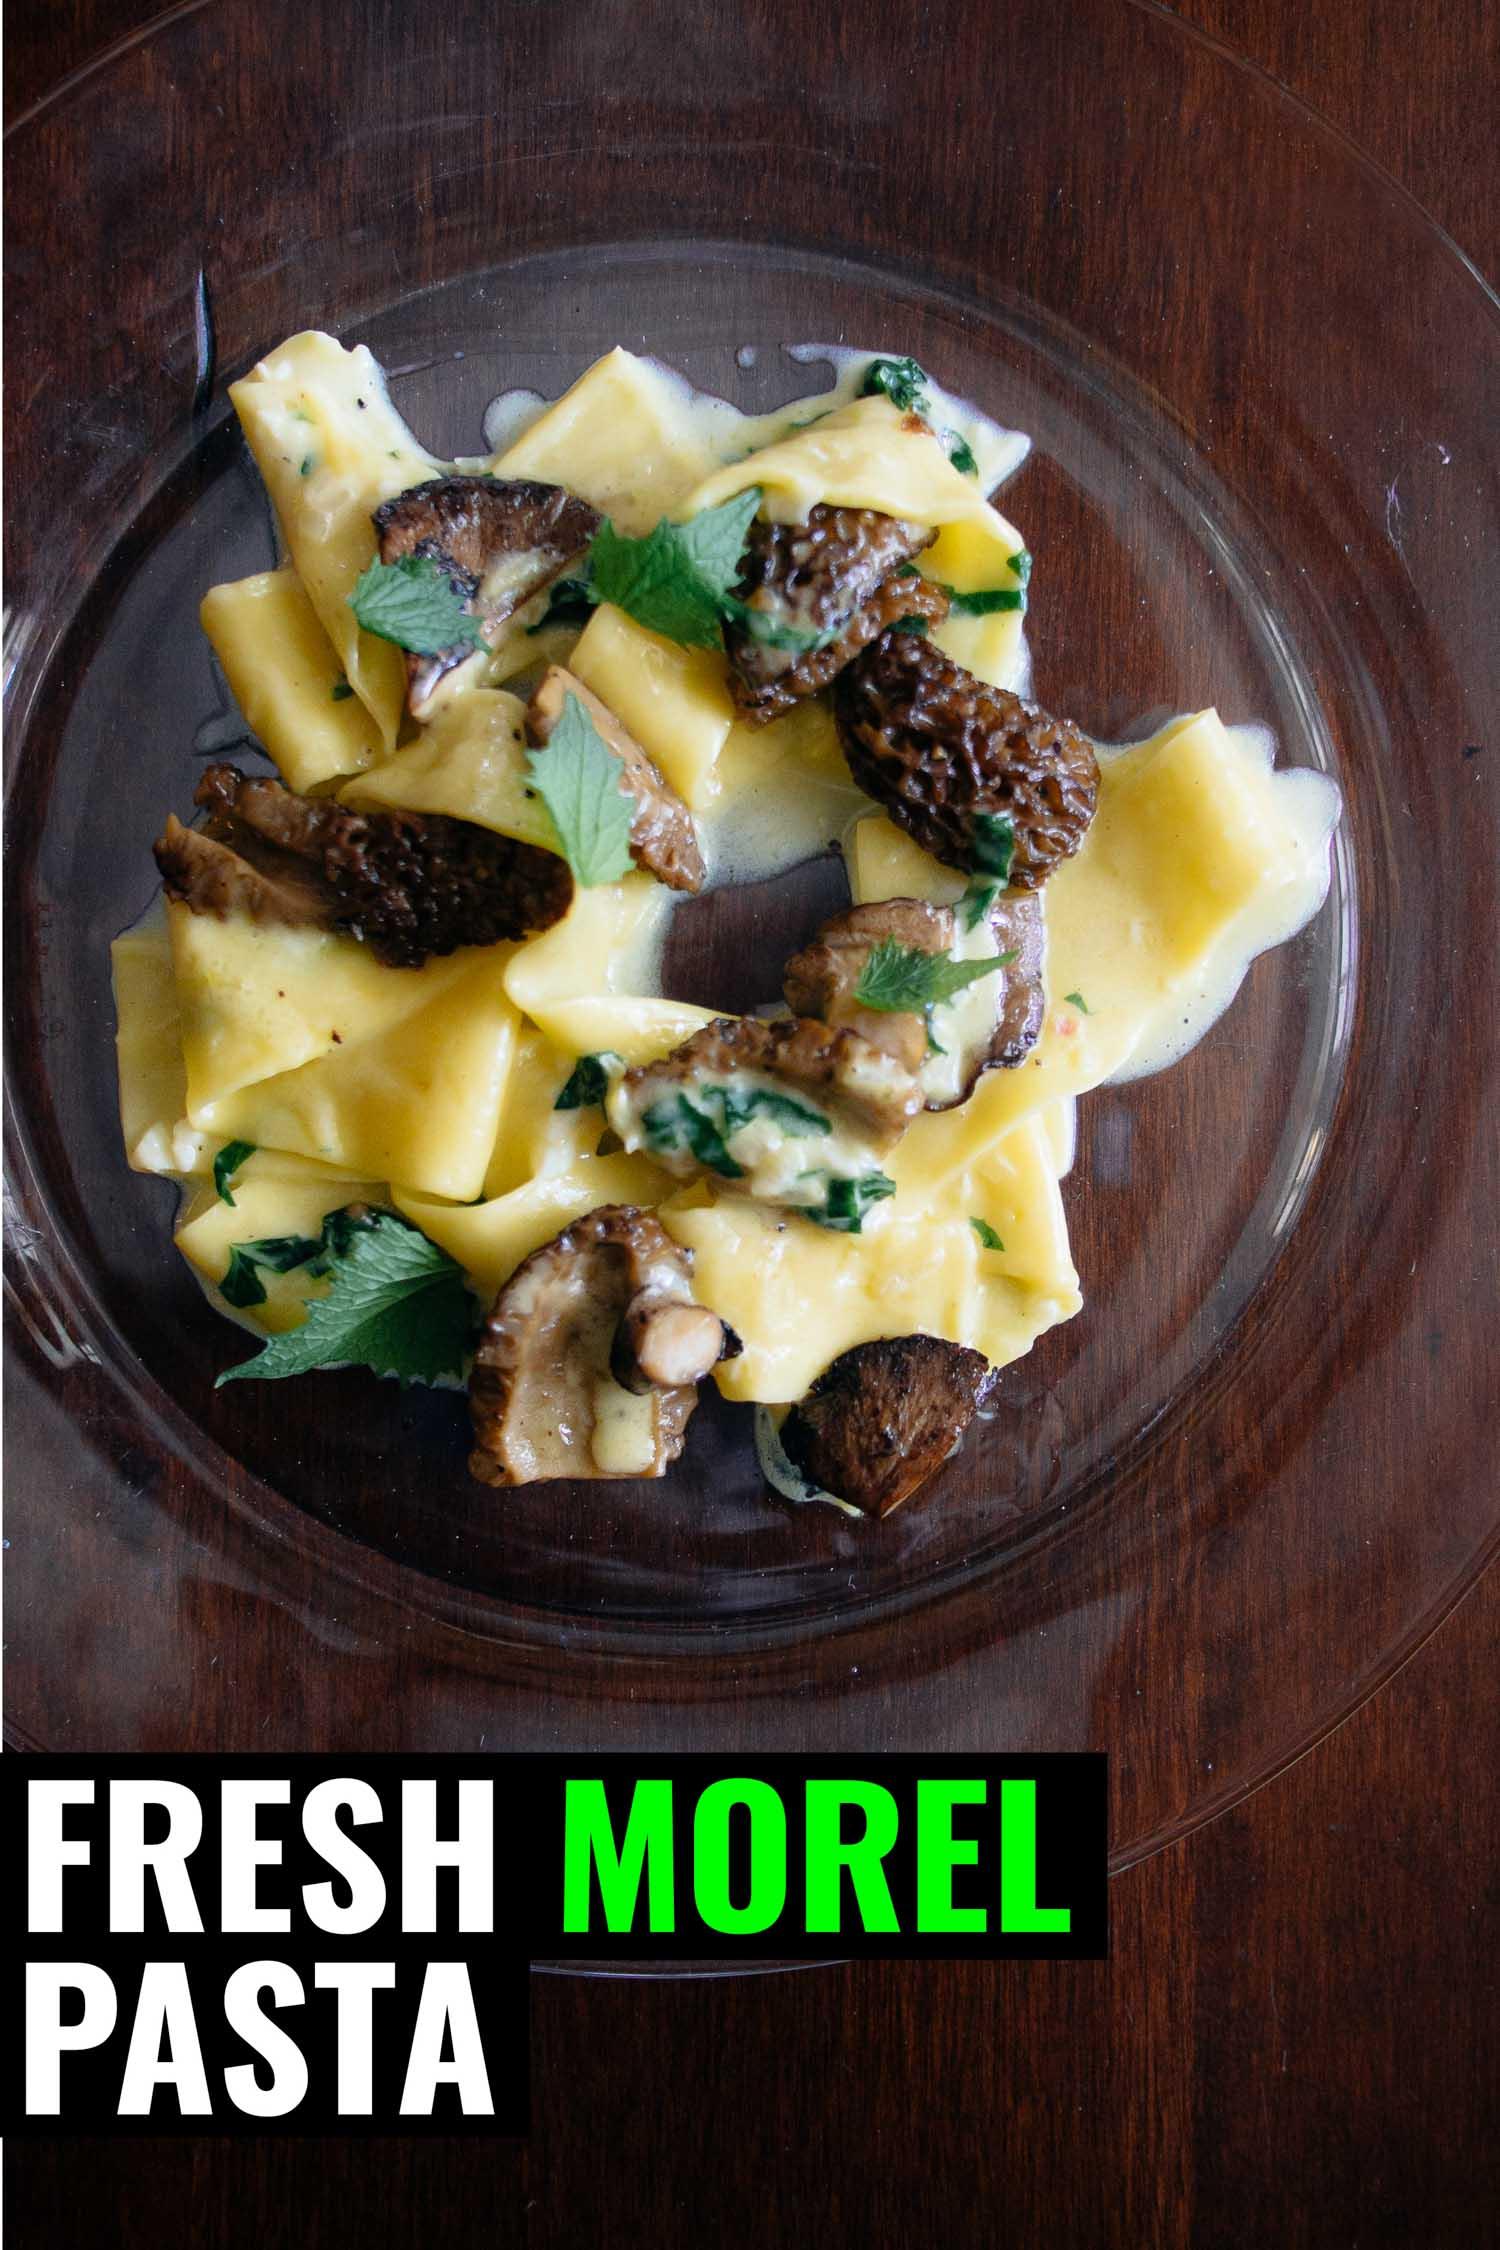 Morel mushroom pasta on a clear plate.